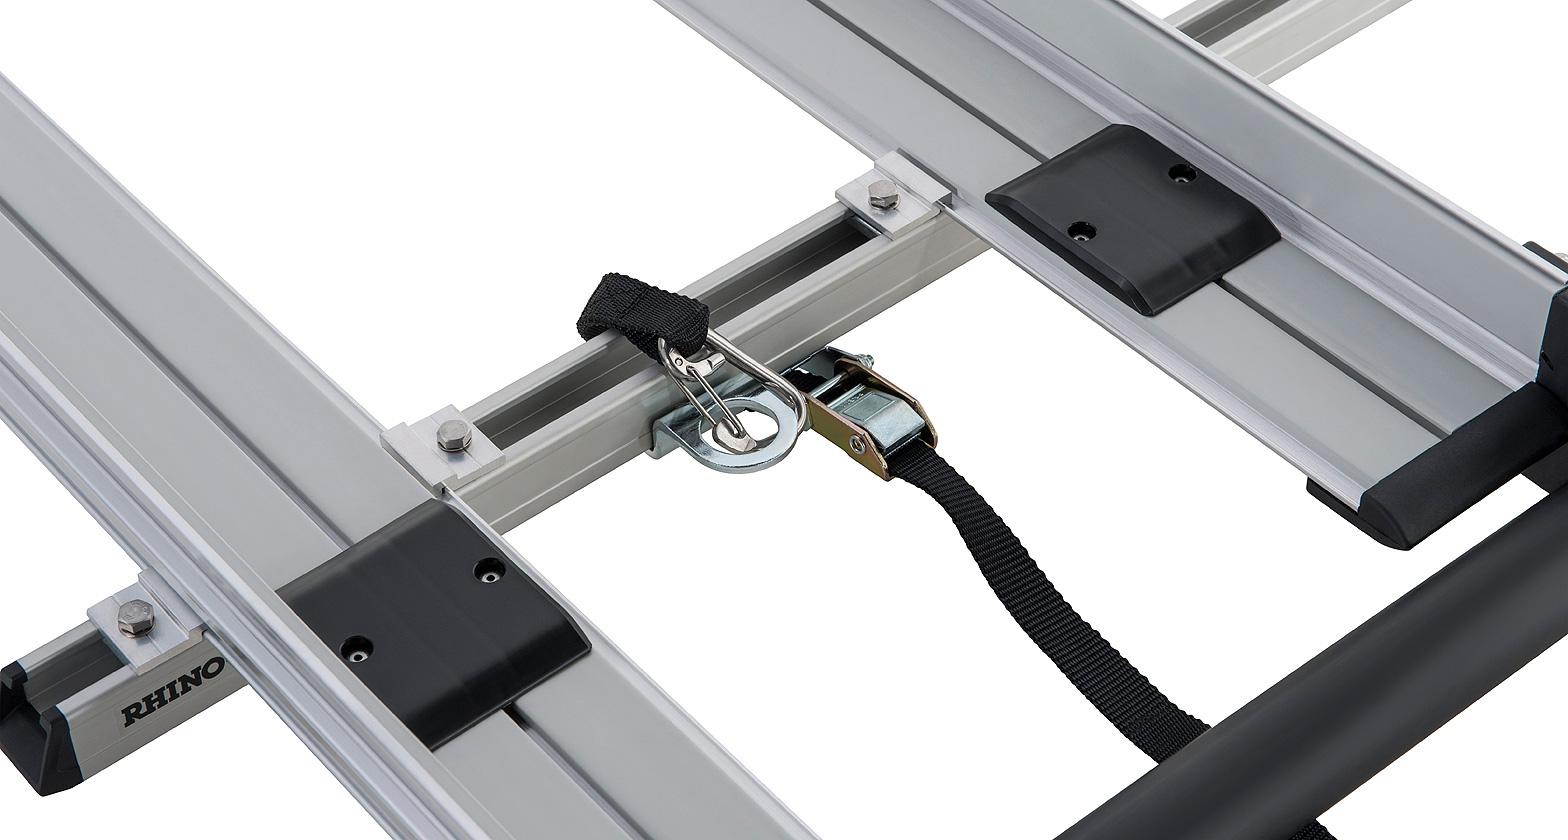 Csl4 Extension Ladder Rack 4m 13 1ft Rhino Rack